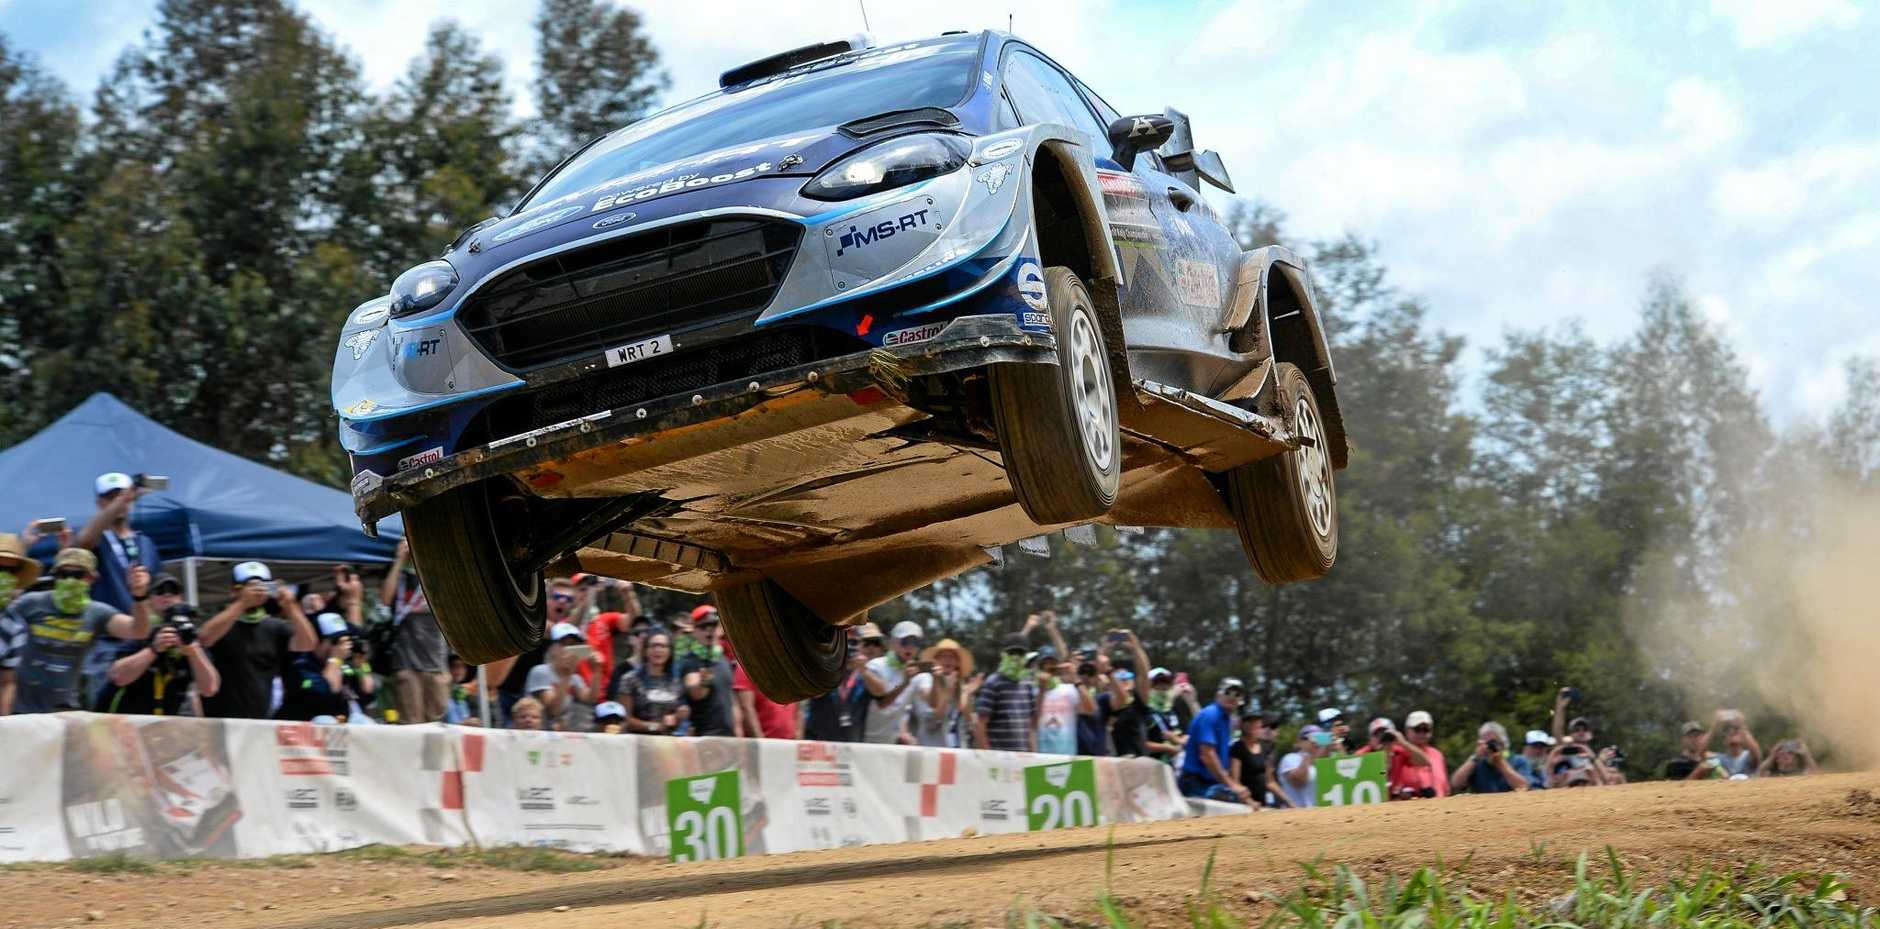 MAKING SPLASH: A bigger jump will thrill spectators on the season-closing Wedding Bells Power Stage.